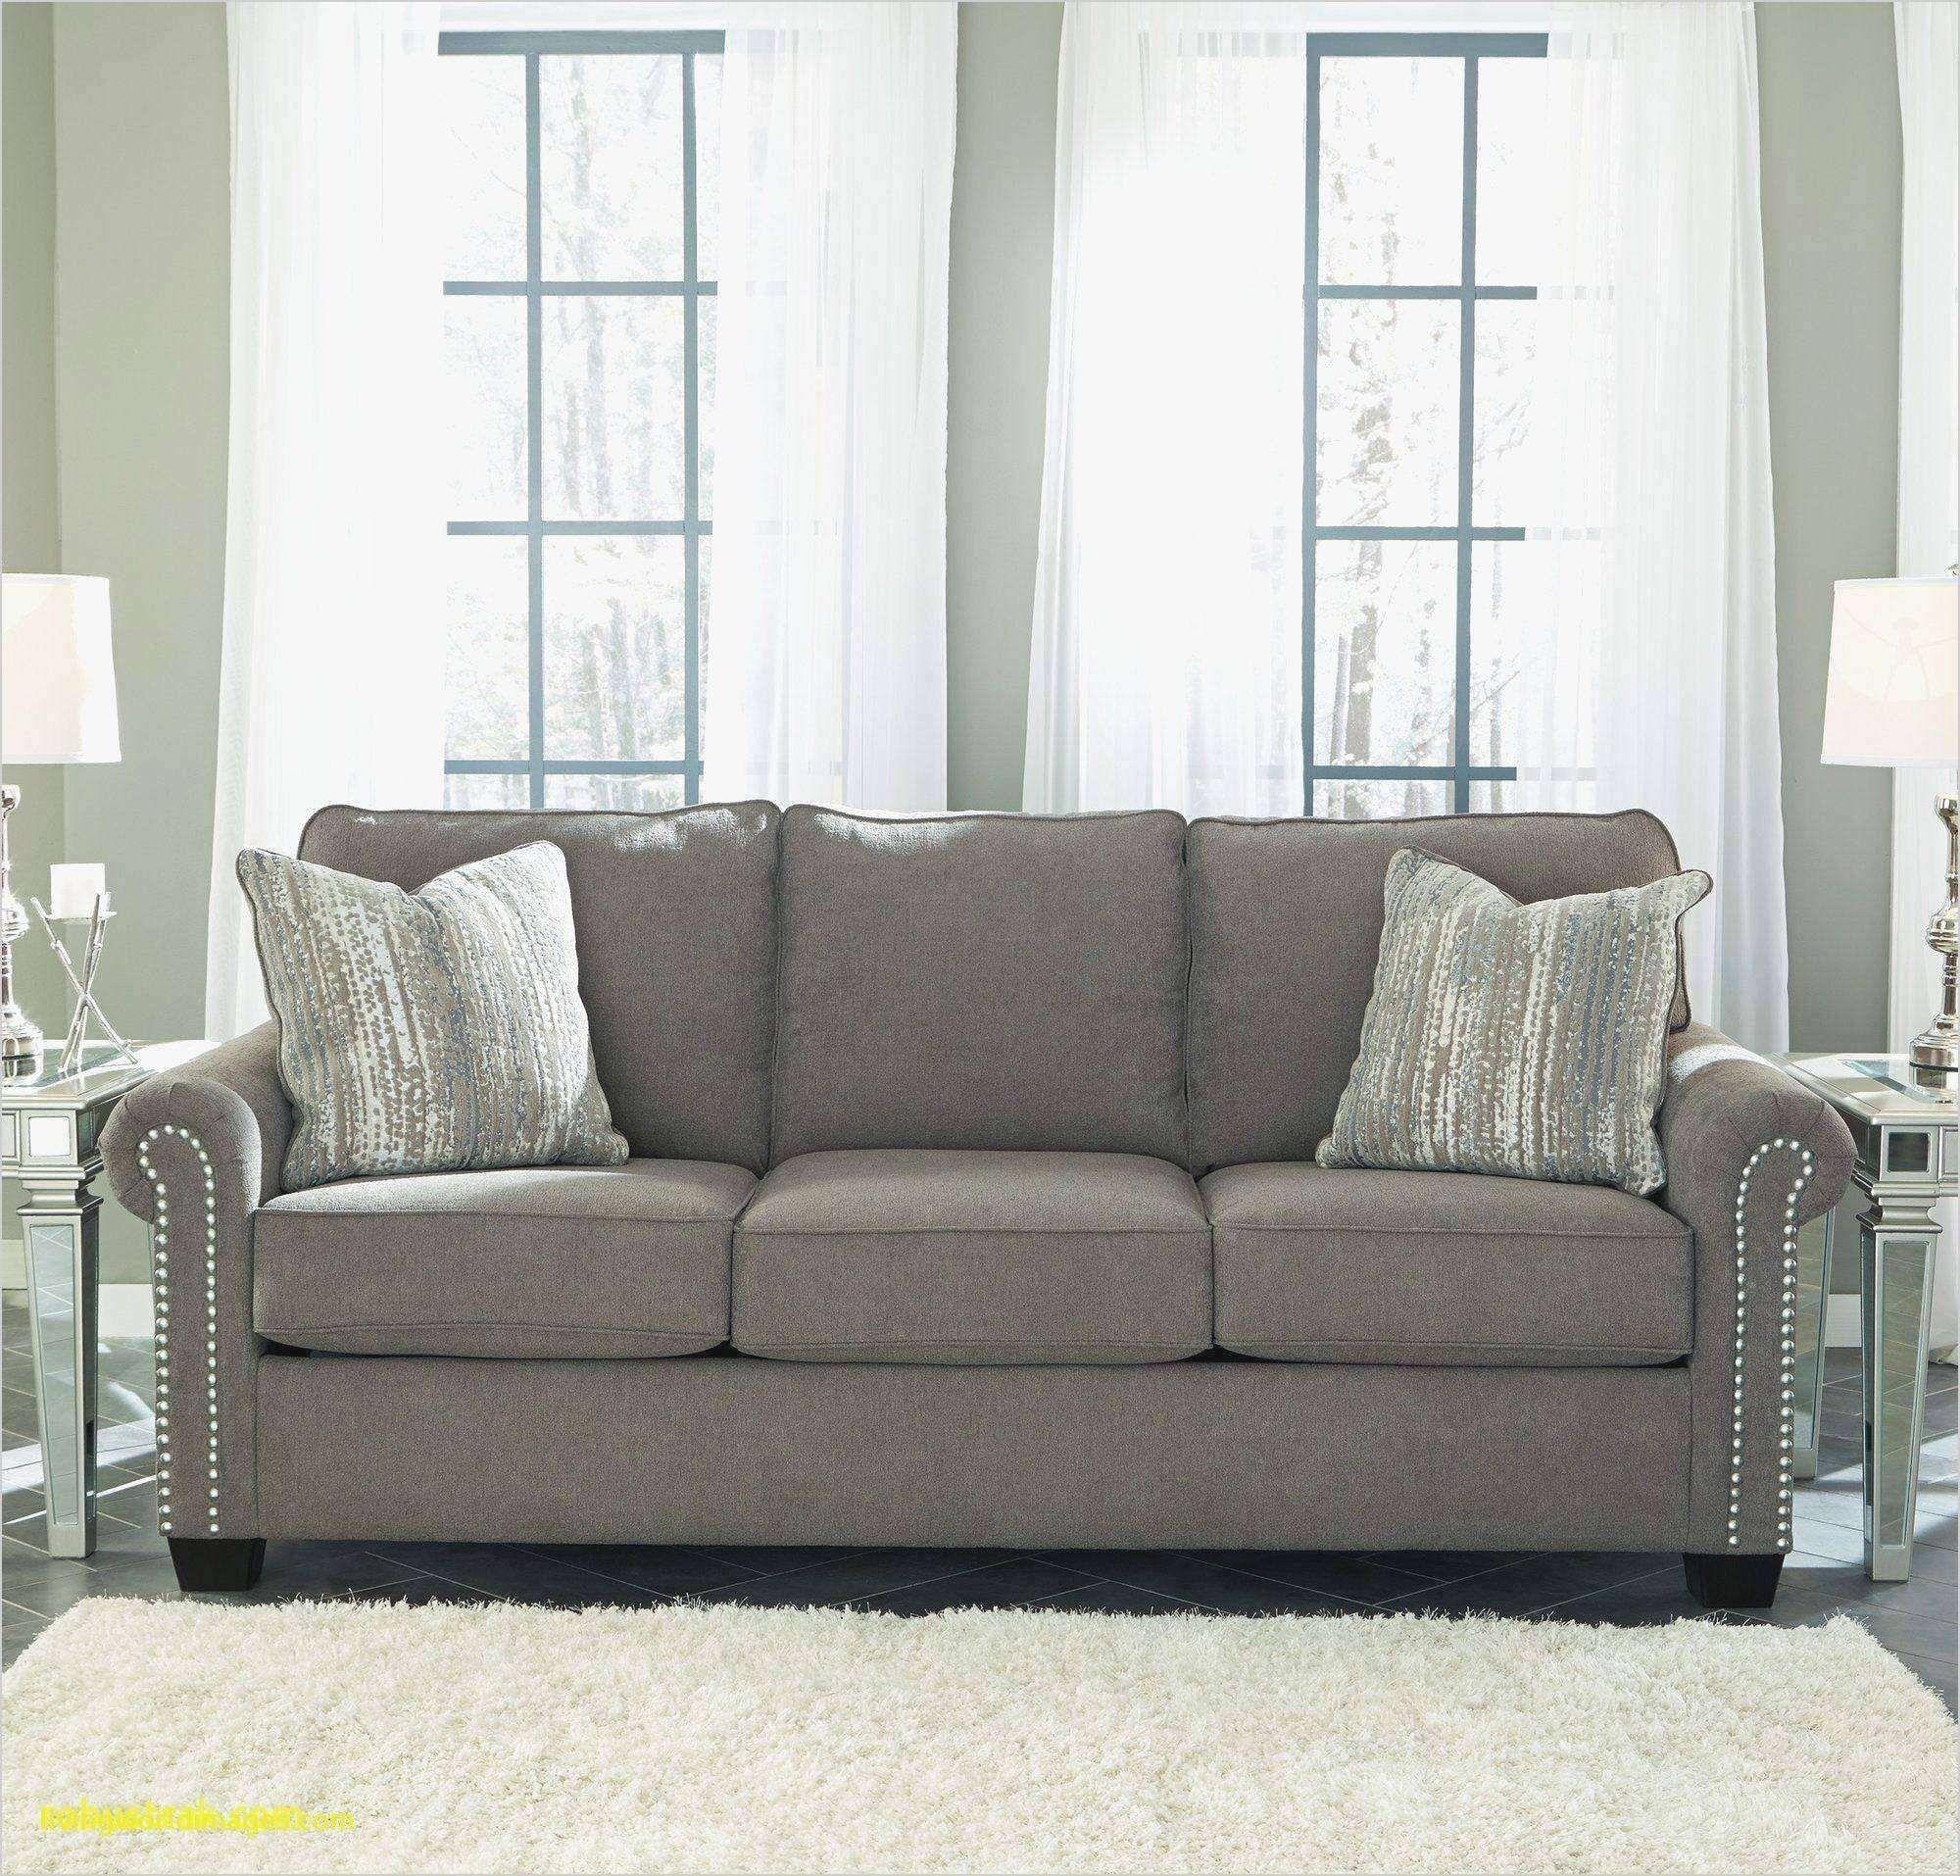 Surprising 46 Fantastic Fresh Living Room Crest Perfect Living Room Machost Co Dining Chair Design Ideas Machostcouk